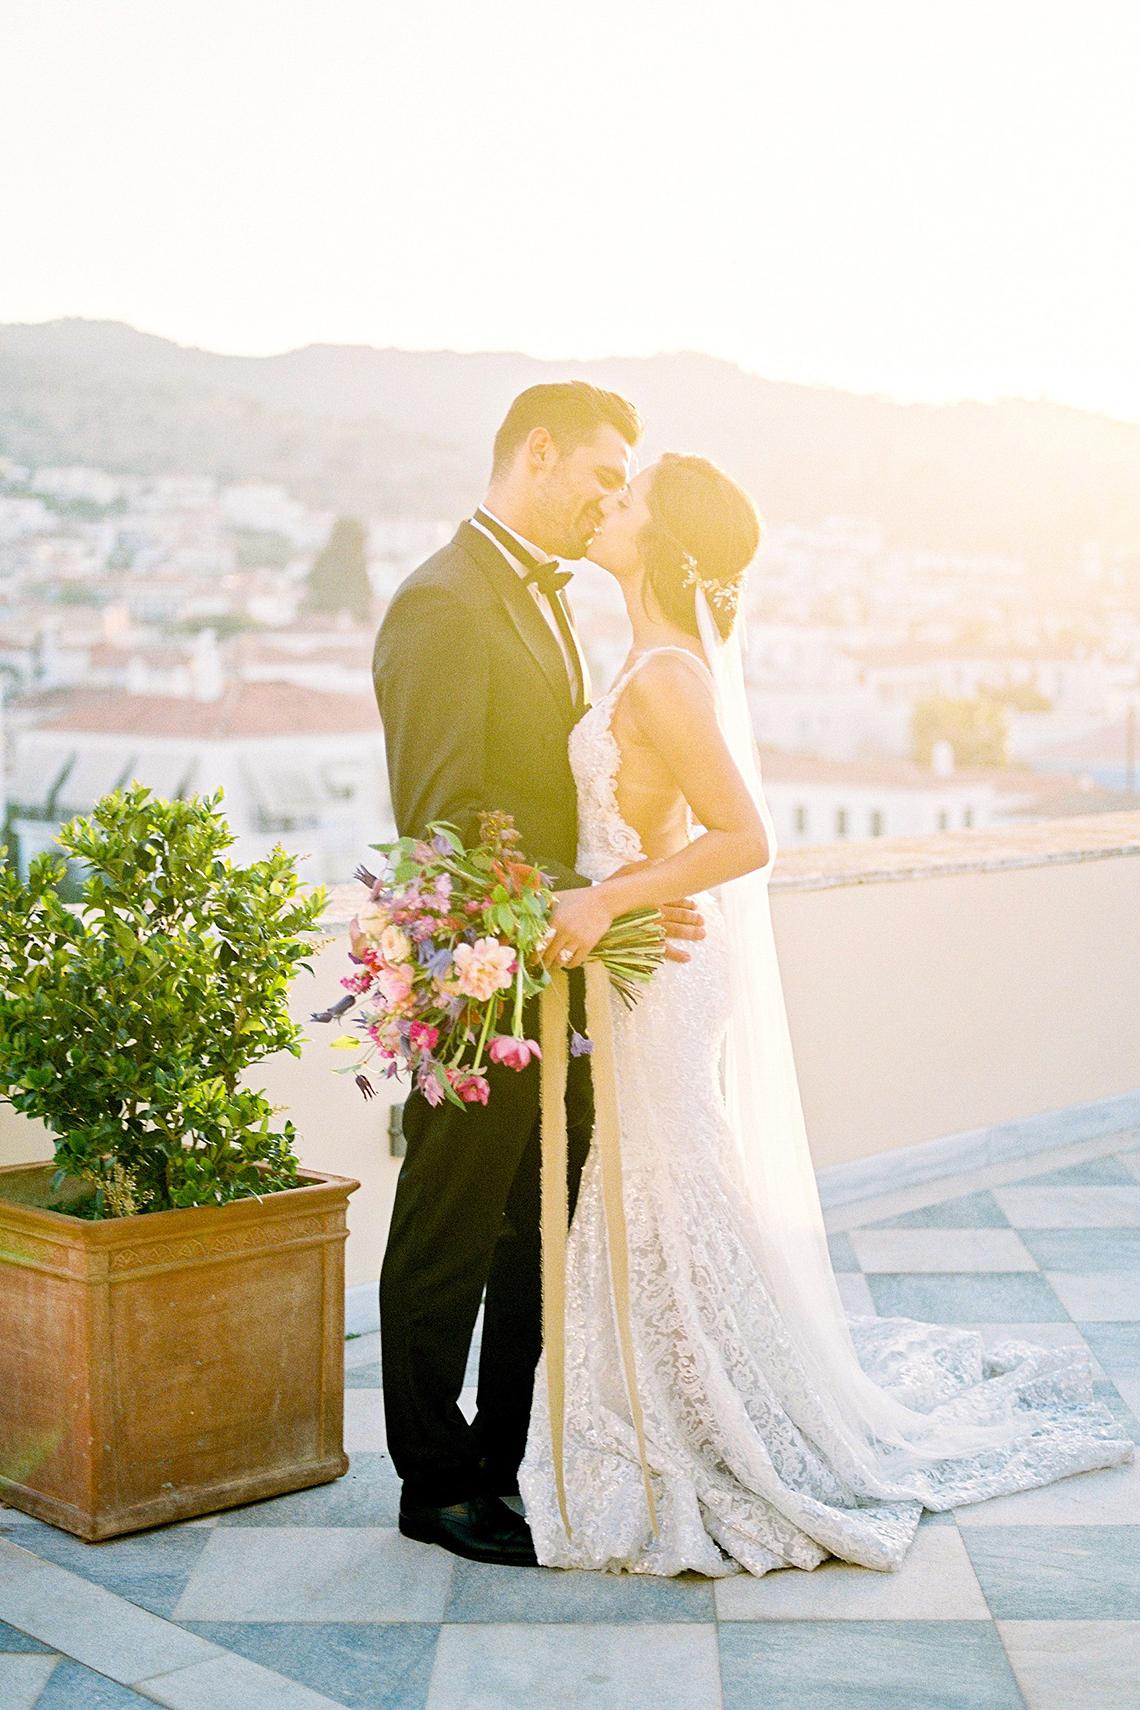 Lavish and Ethereal Greek Hotel Wedding Inspiration – Camilla Cosme Photography 22